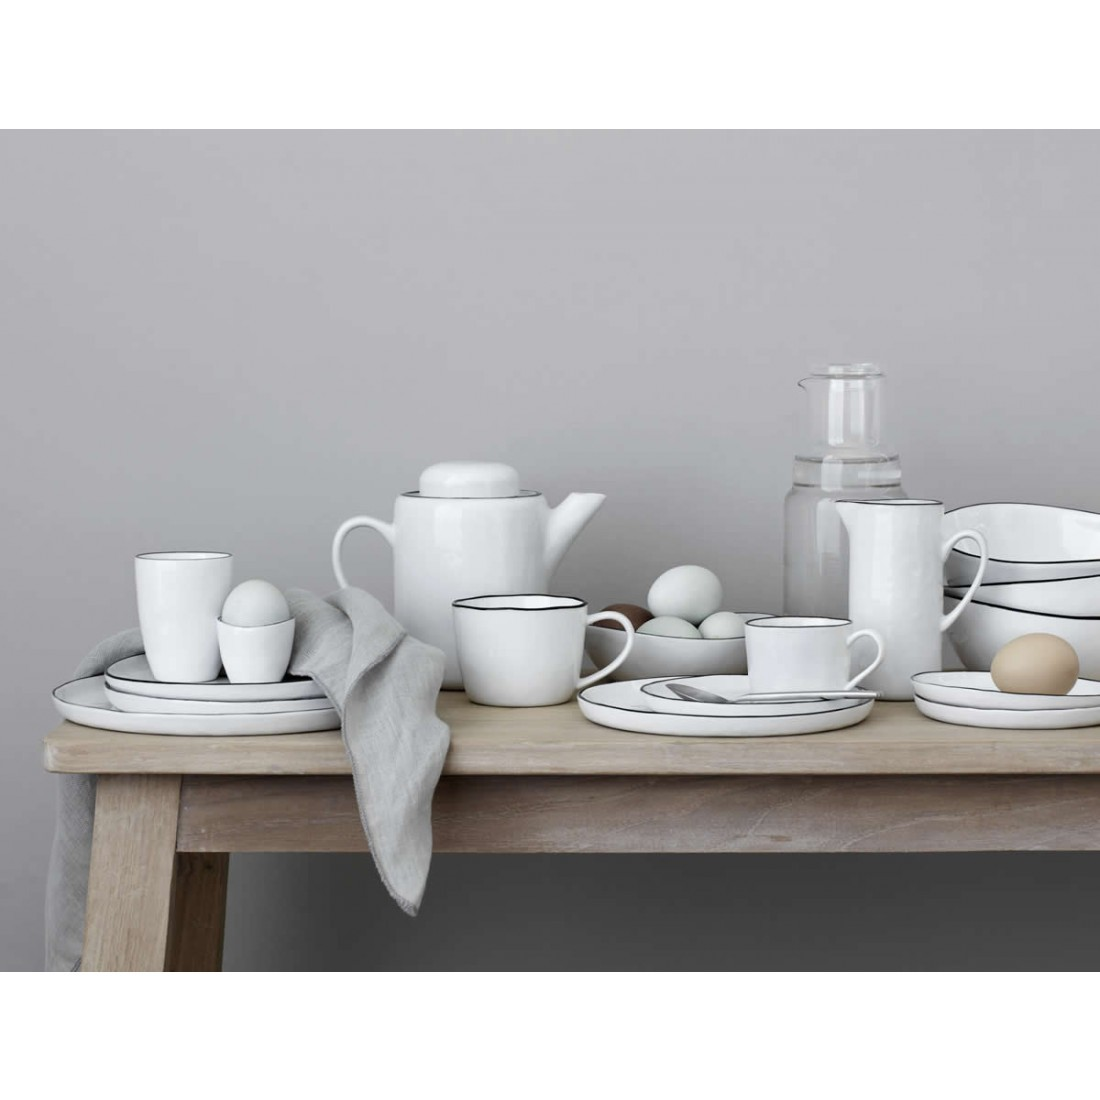 broste salt espressokopje porselein. Black Bedroom Furniture Sets. Home Design Ideas